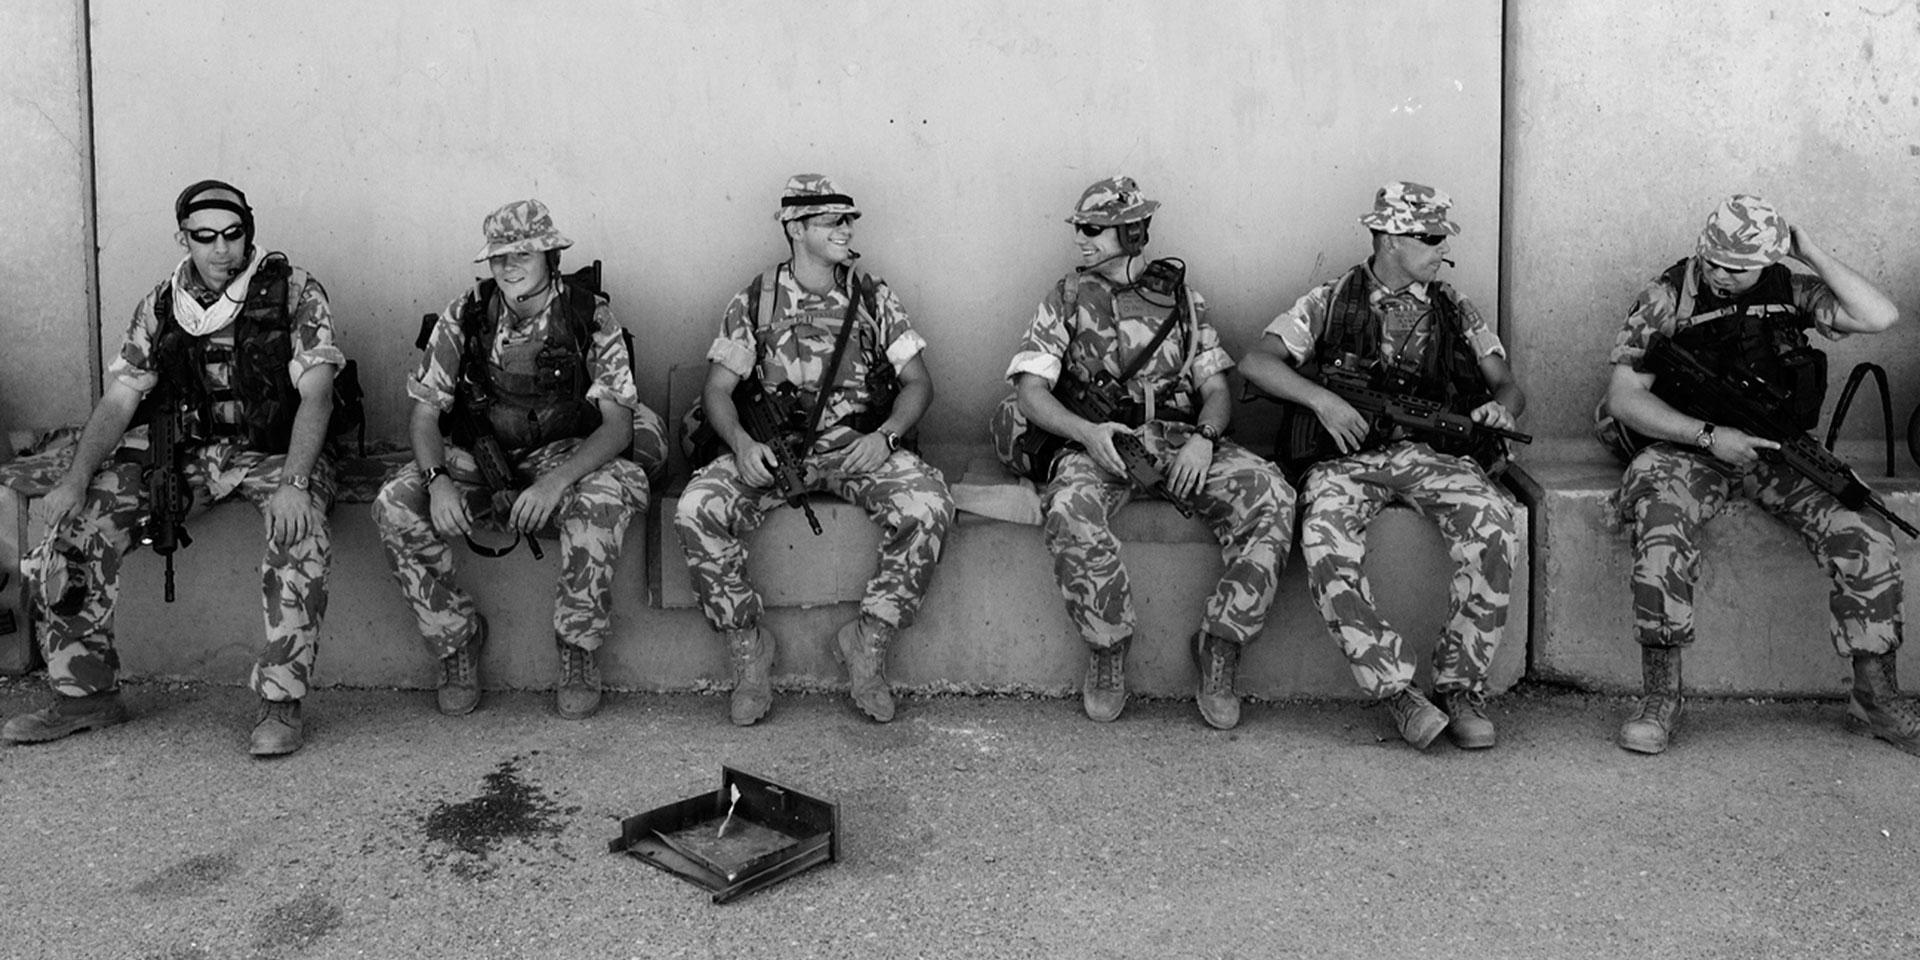 Soldiers of 1st Battalion The Cheshire Regiment, Basra, Iraq, 2004